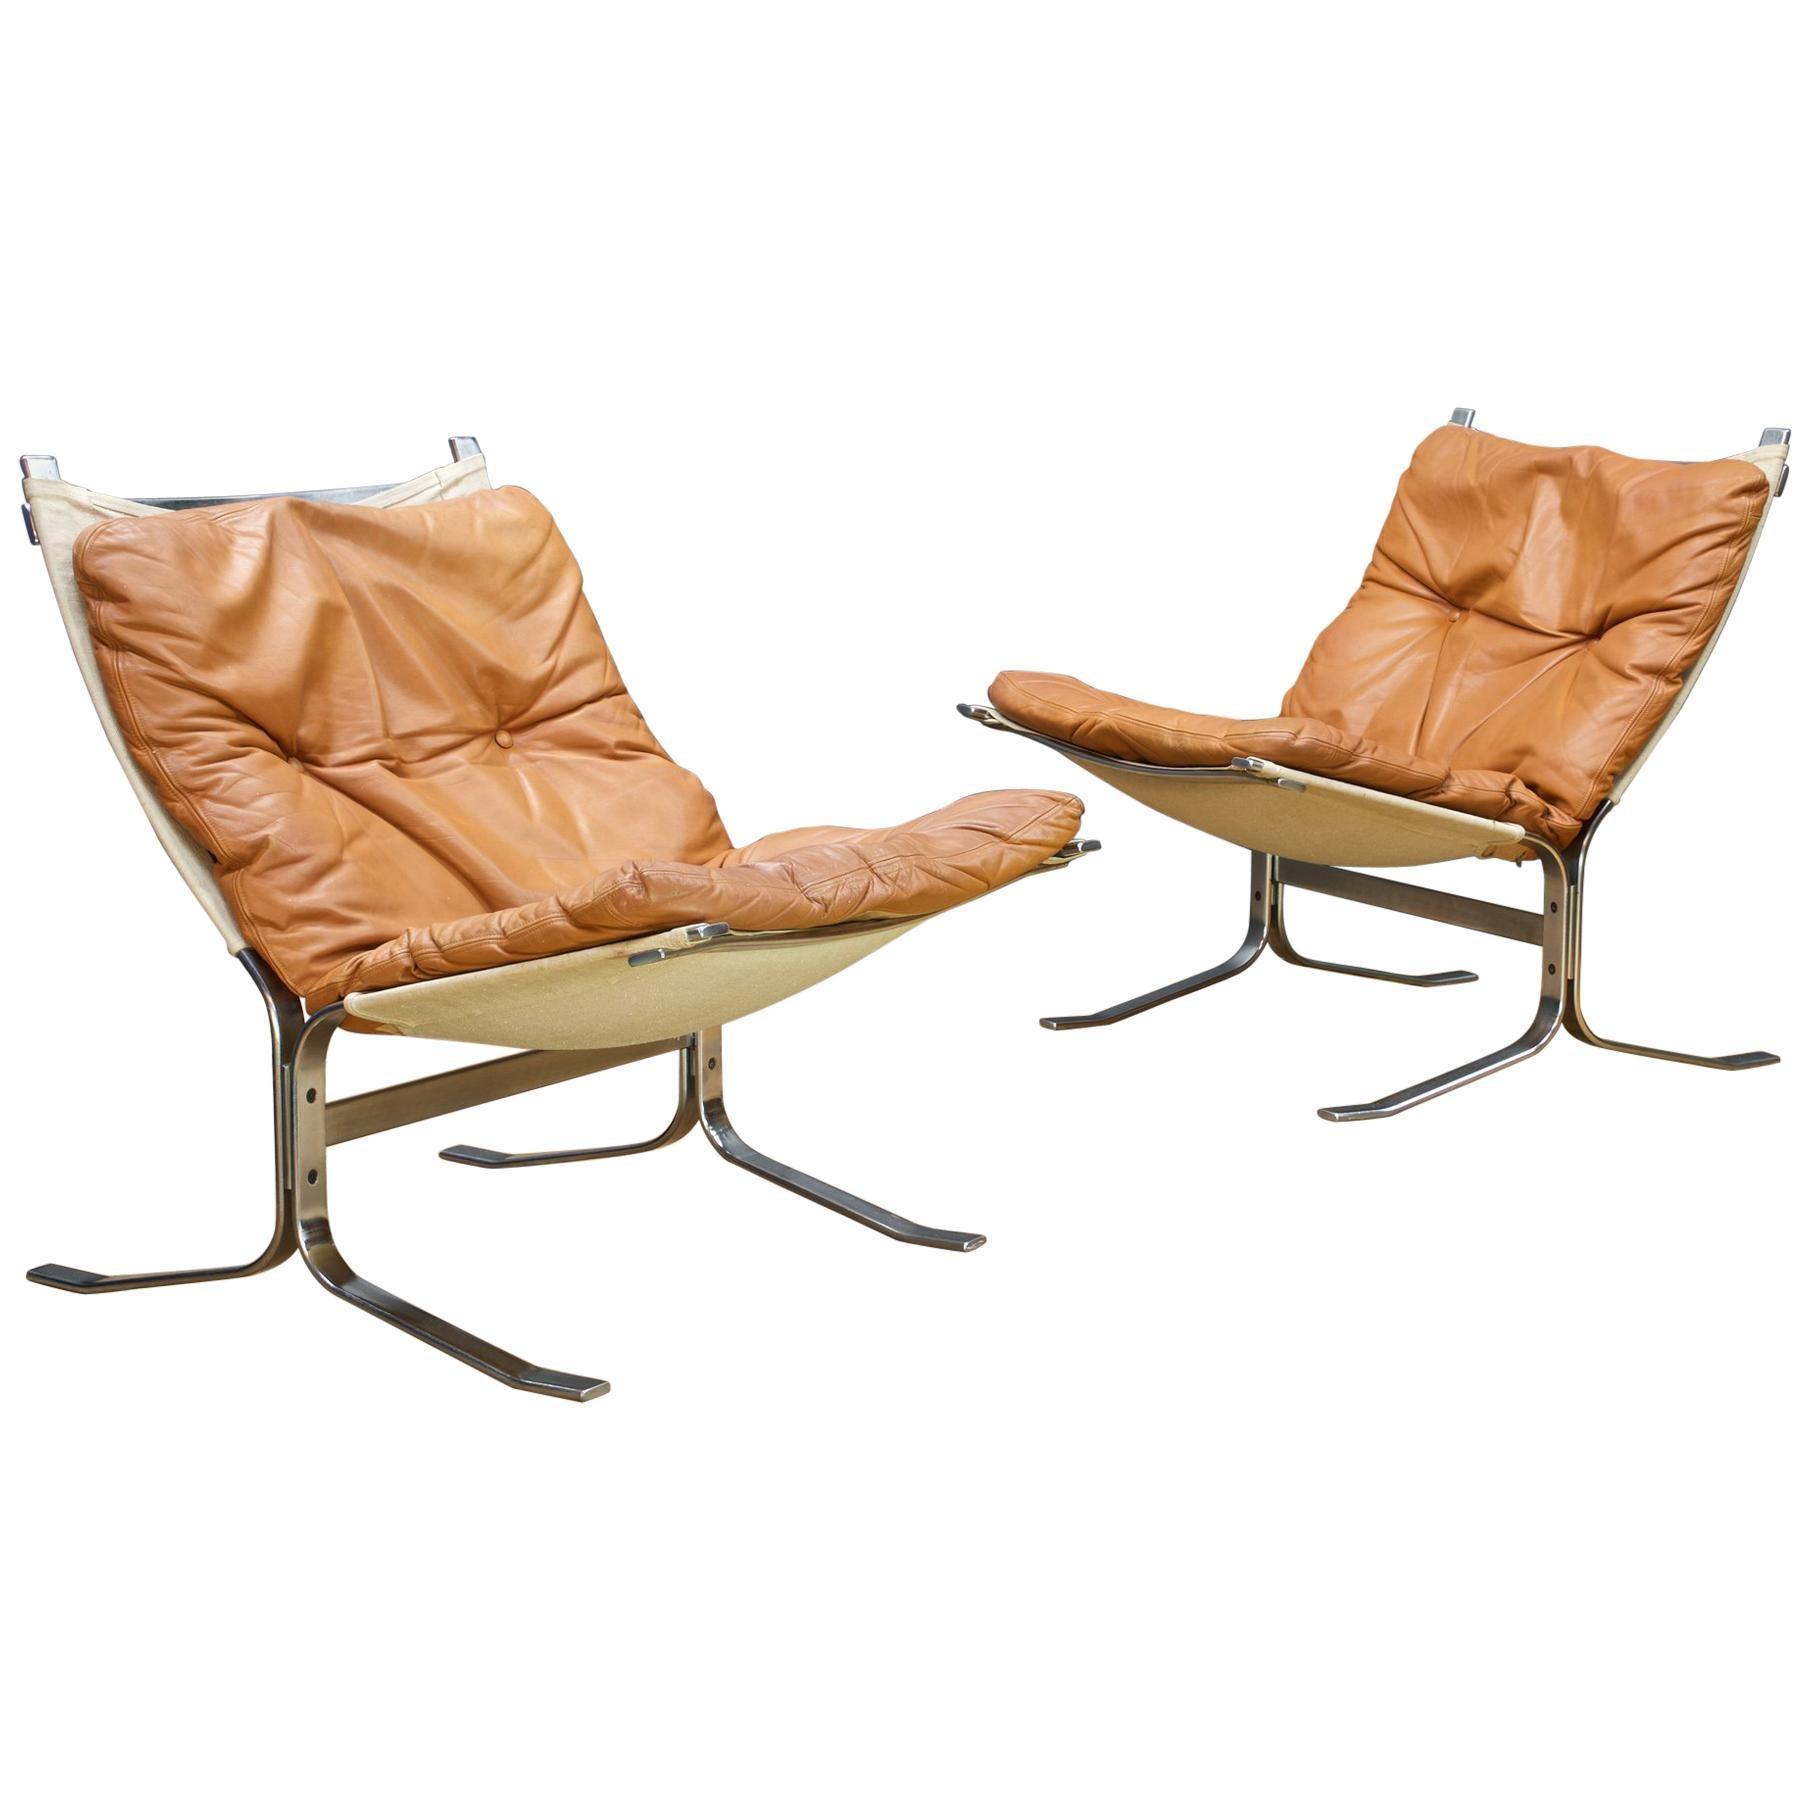 1960s Scandinavian Steel Leather Sling Lounge Chairs Mid Century Minimalist